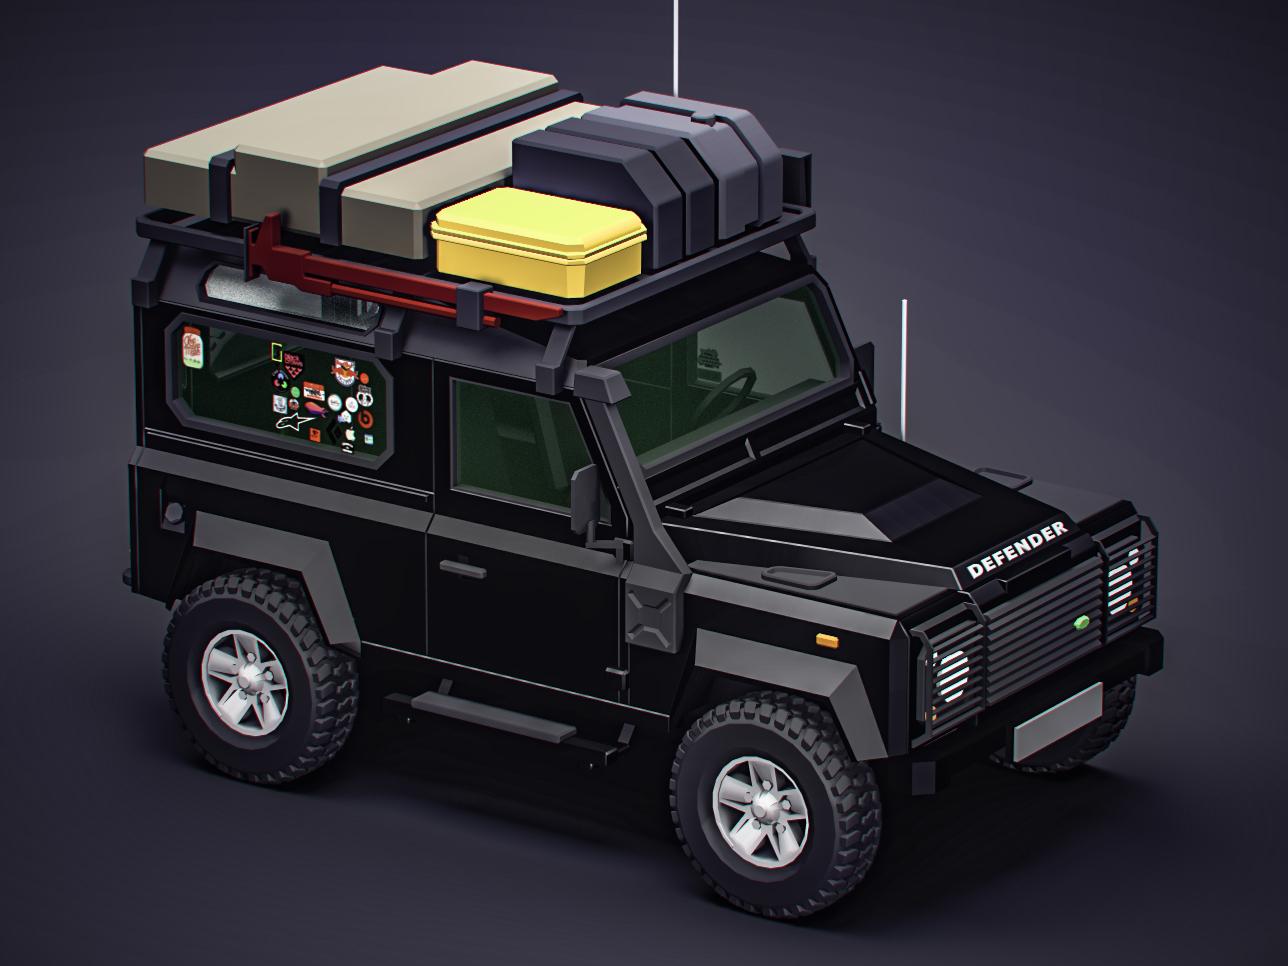 My defender 3d art vectary illustration isometric render cgi 3d camper offroad car d90 defender land rover